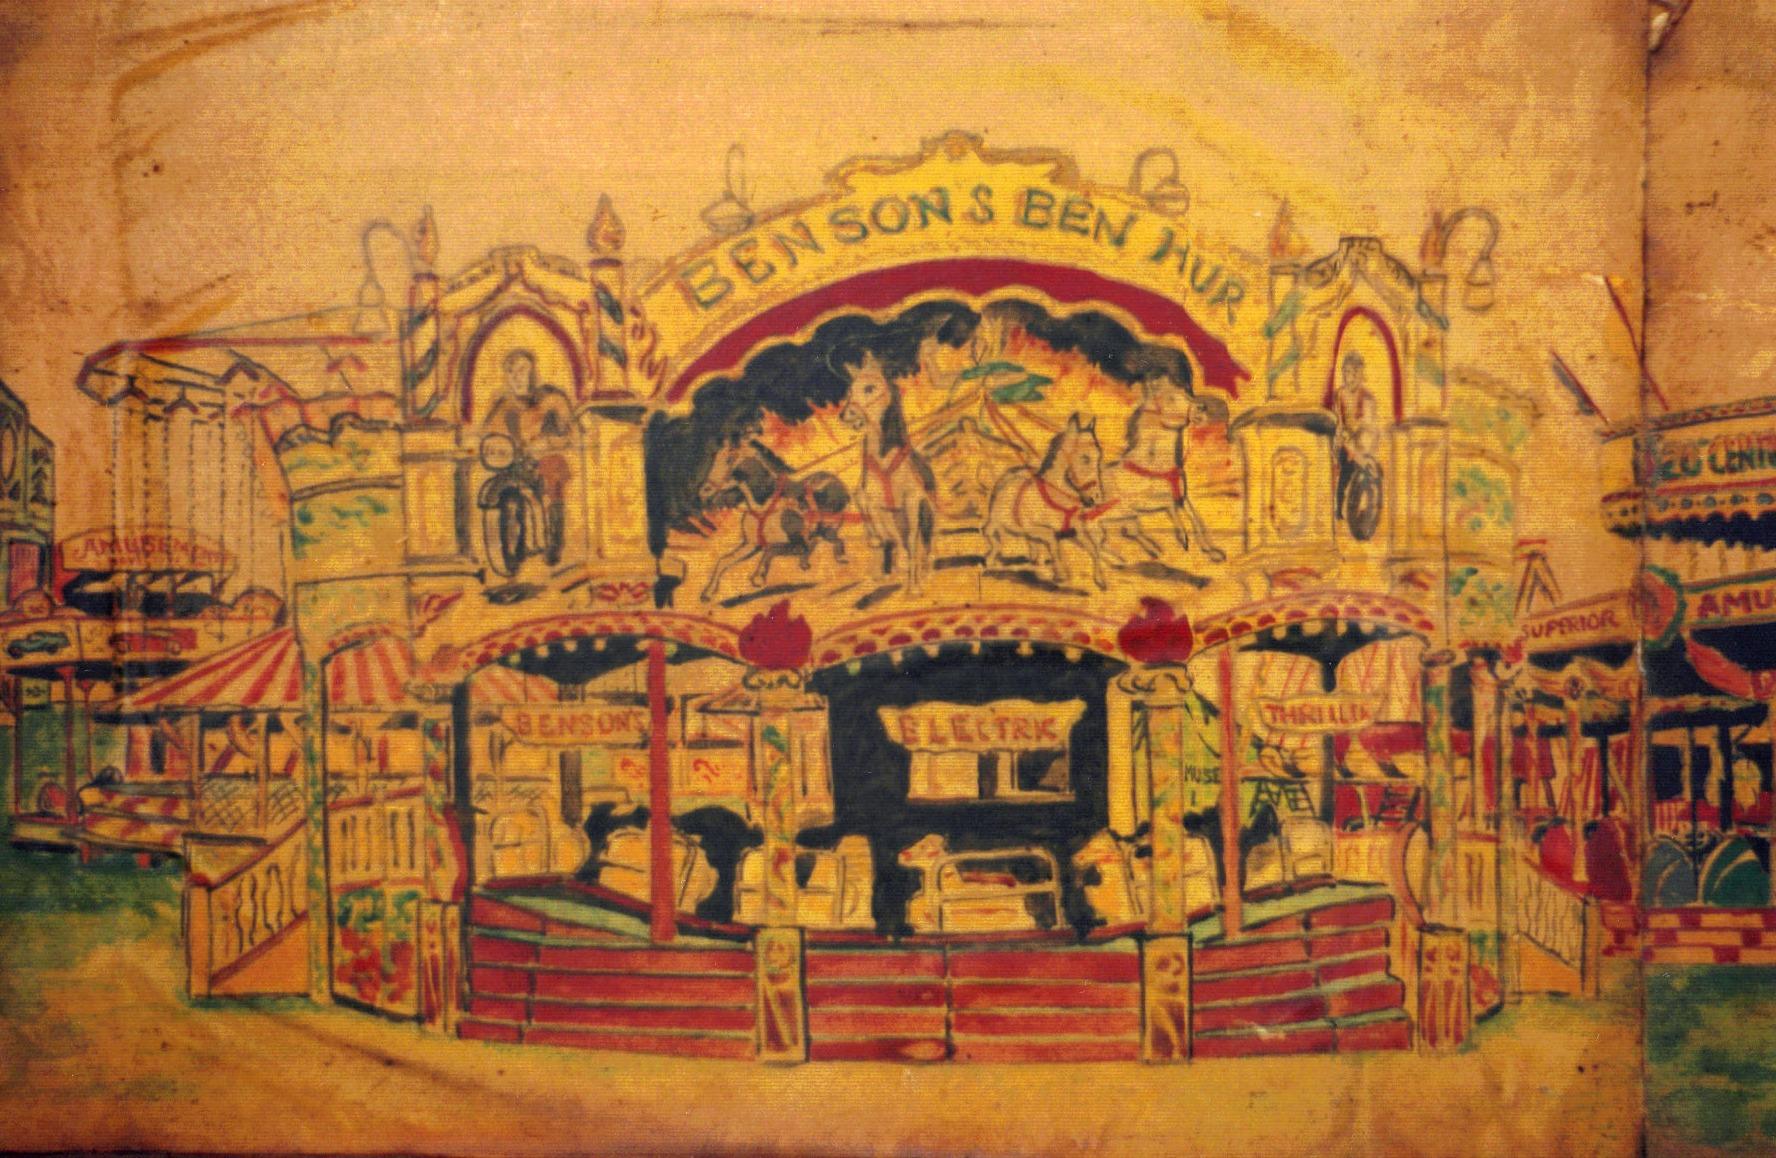 Benson's Speedway Ark